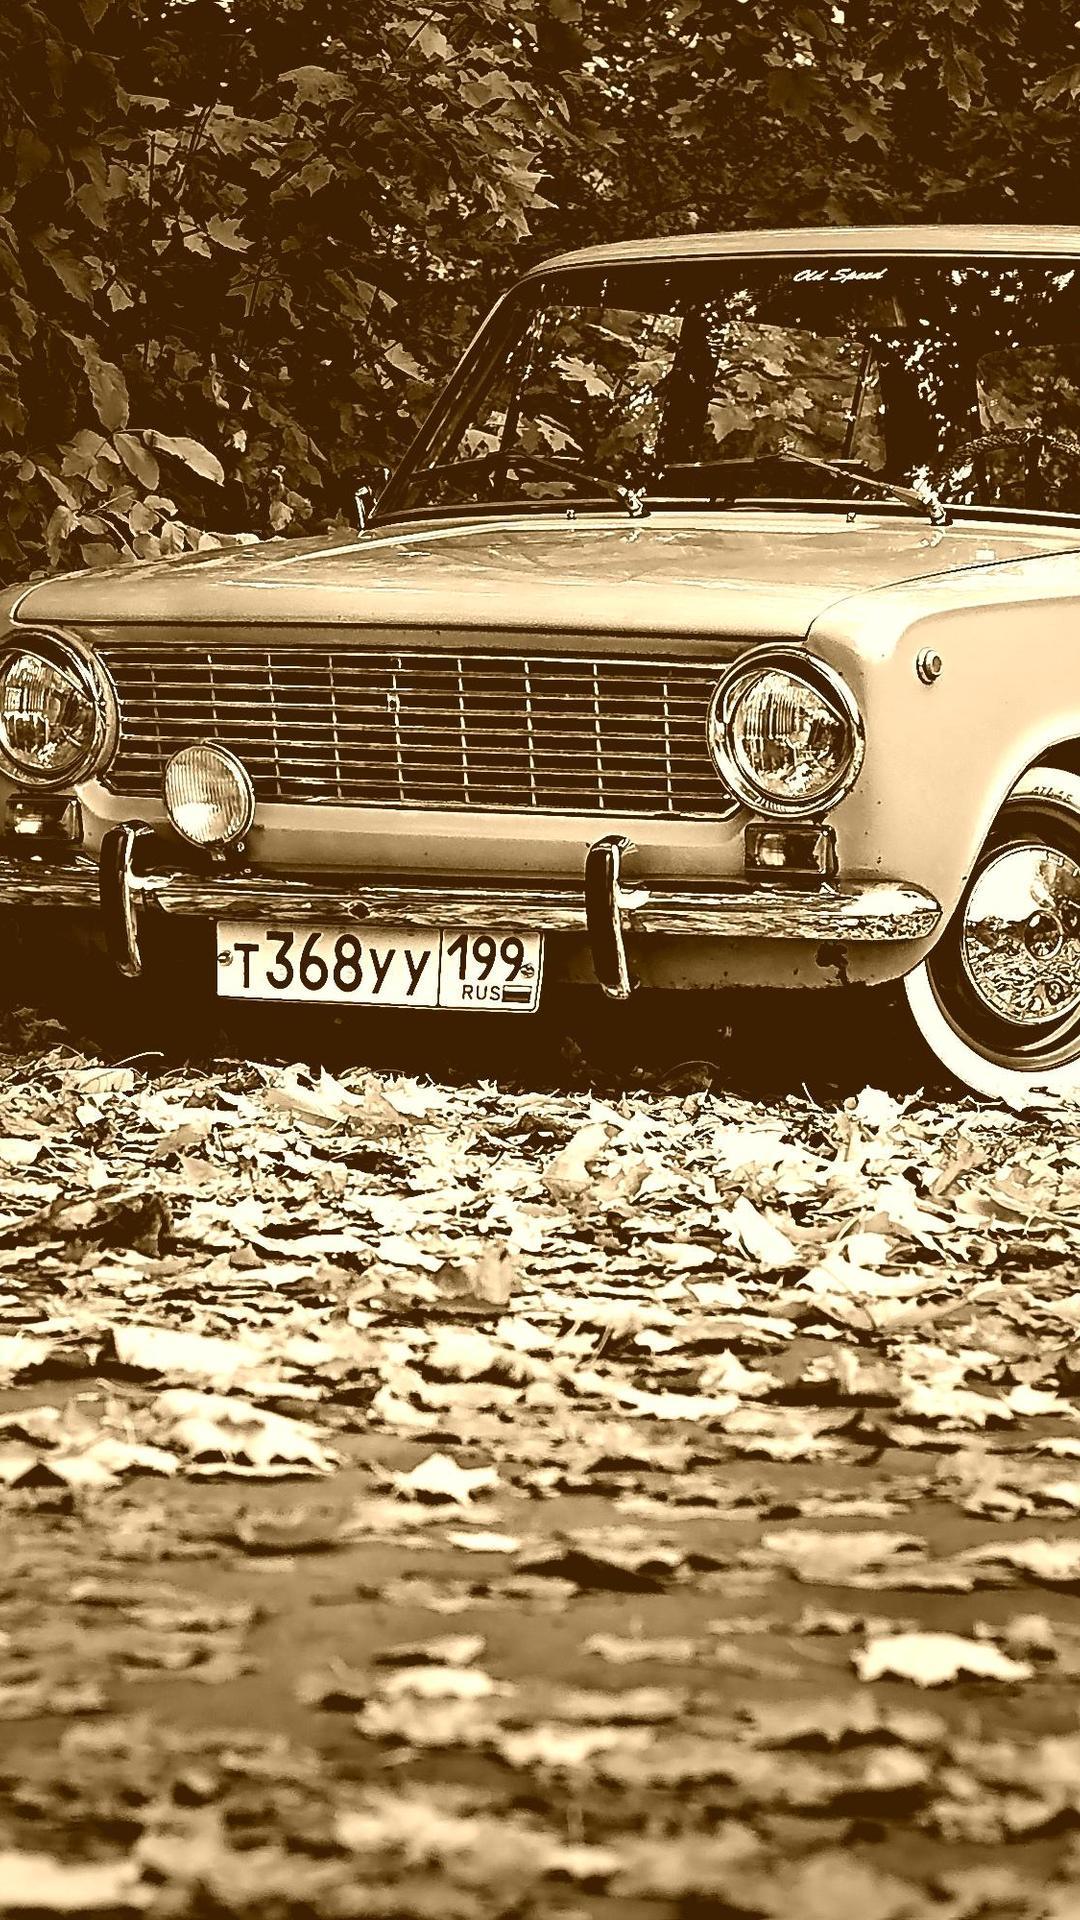 Black and white wallpaper - Old vintage car Wallpaper Download 1080x1920